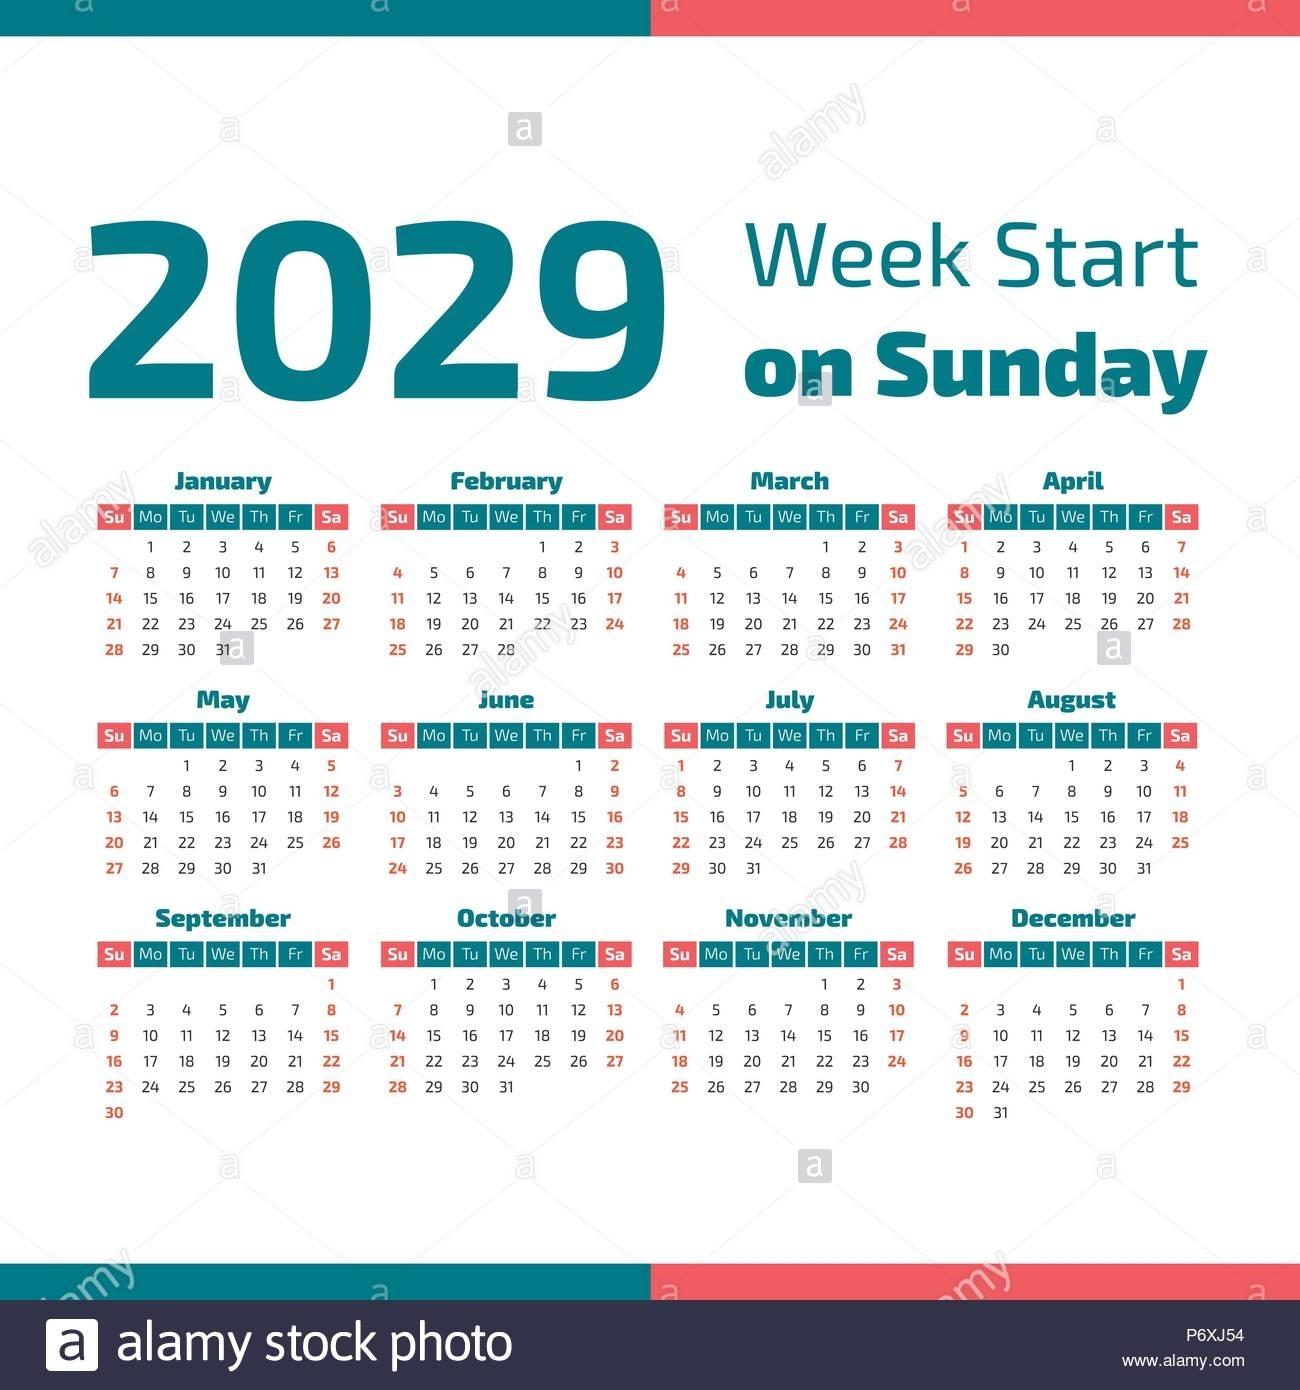 Simple 2029 Year Calendar, Week Starts On Sunday Stock Vector Art & Illustration, Vector Image